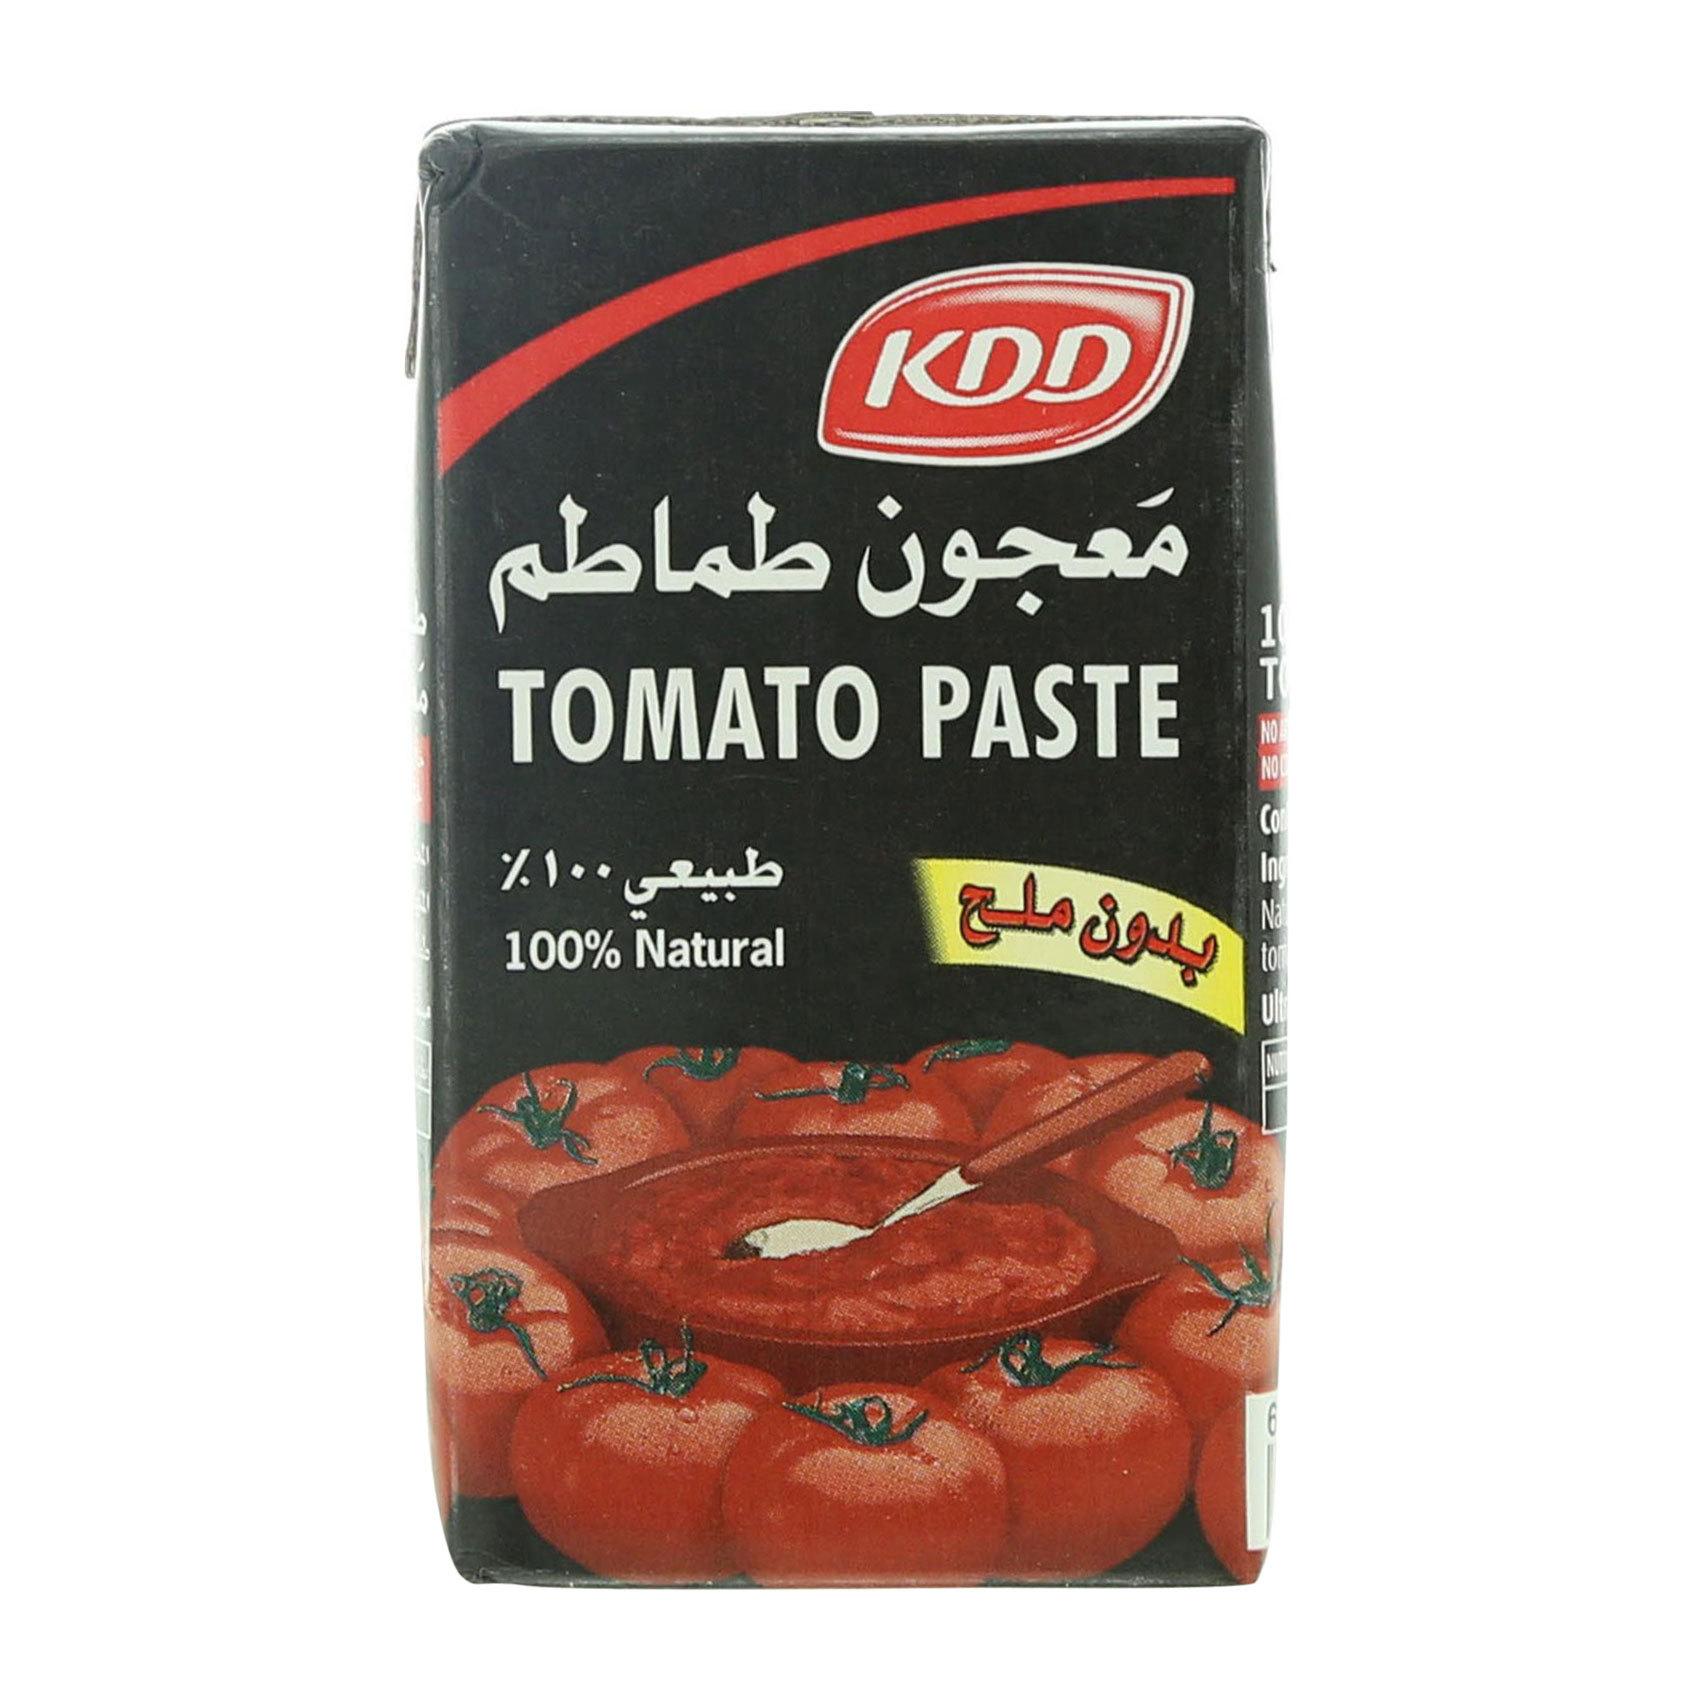 KDD TOMATO PASTE 135GR